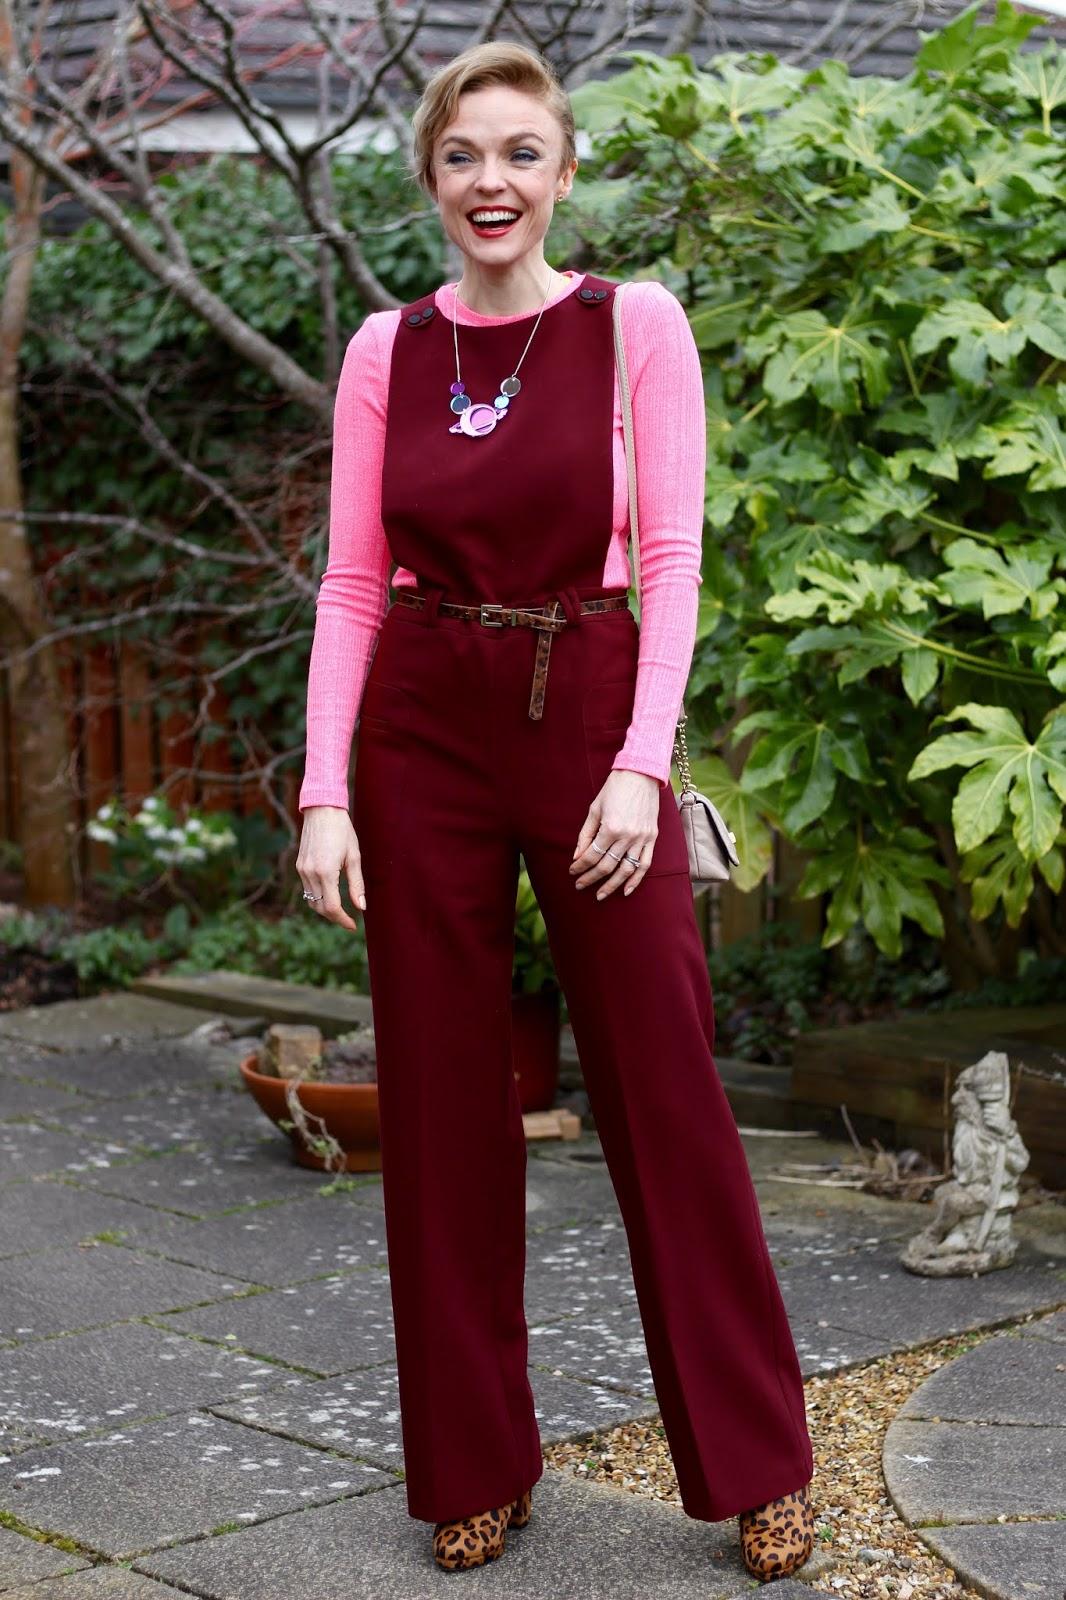 Burgundy Jumpsuit, Neon Pink, Leopard Boots | Fake Fabulous